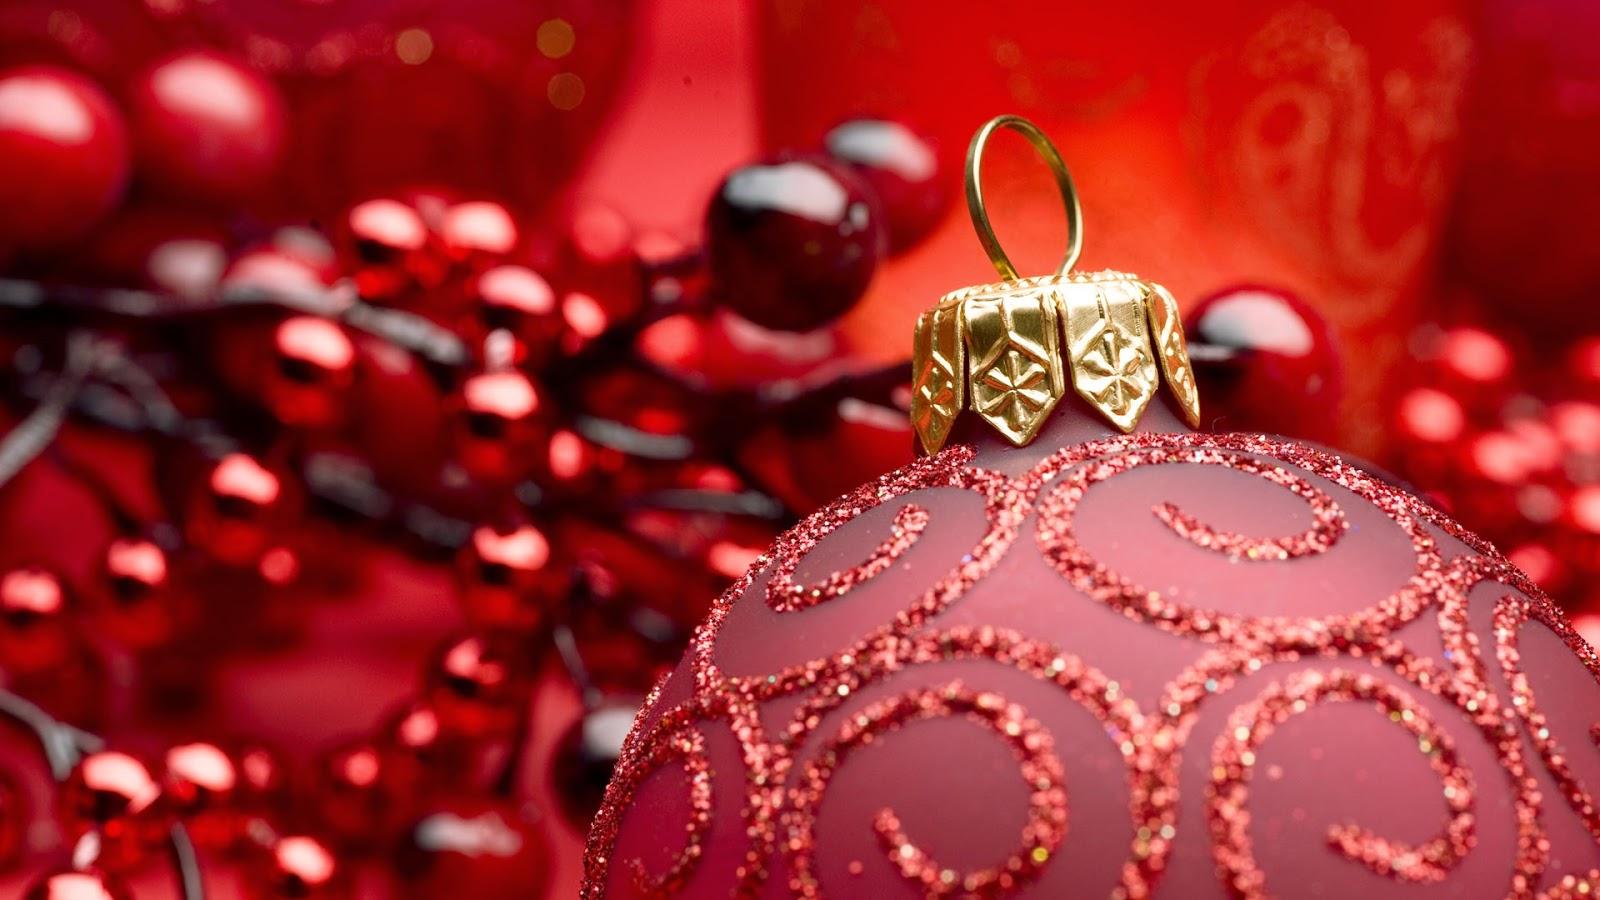 Natale Immagini Hd.And Also Download Christmas Wallpapers Hd Wadescreen Tanti Auguri Di Buon Natale 98940 Hd Wallpaper Backgrounds Download